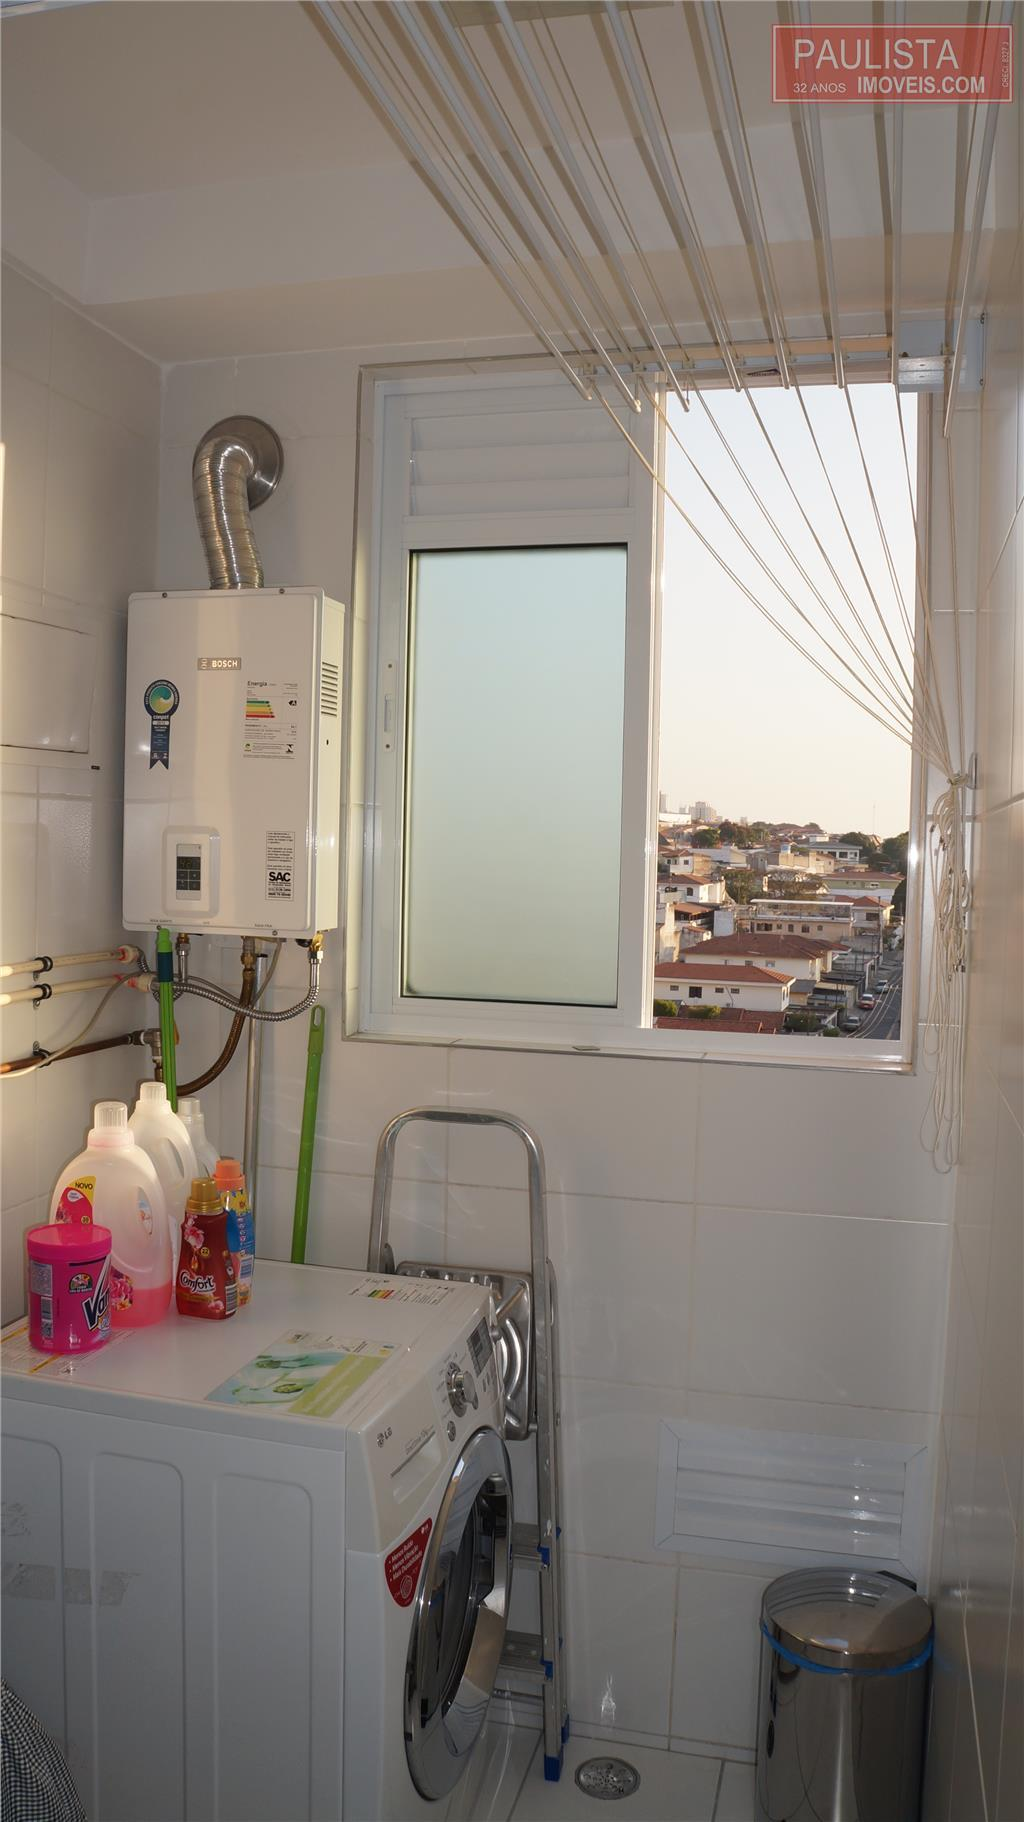 Paulista Imóveis - Apto 2 Dorm, Jardim Prudência - Foto 12